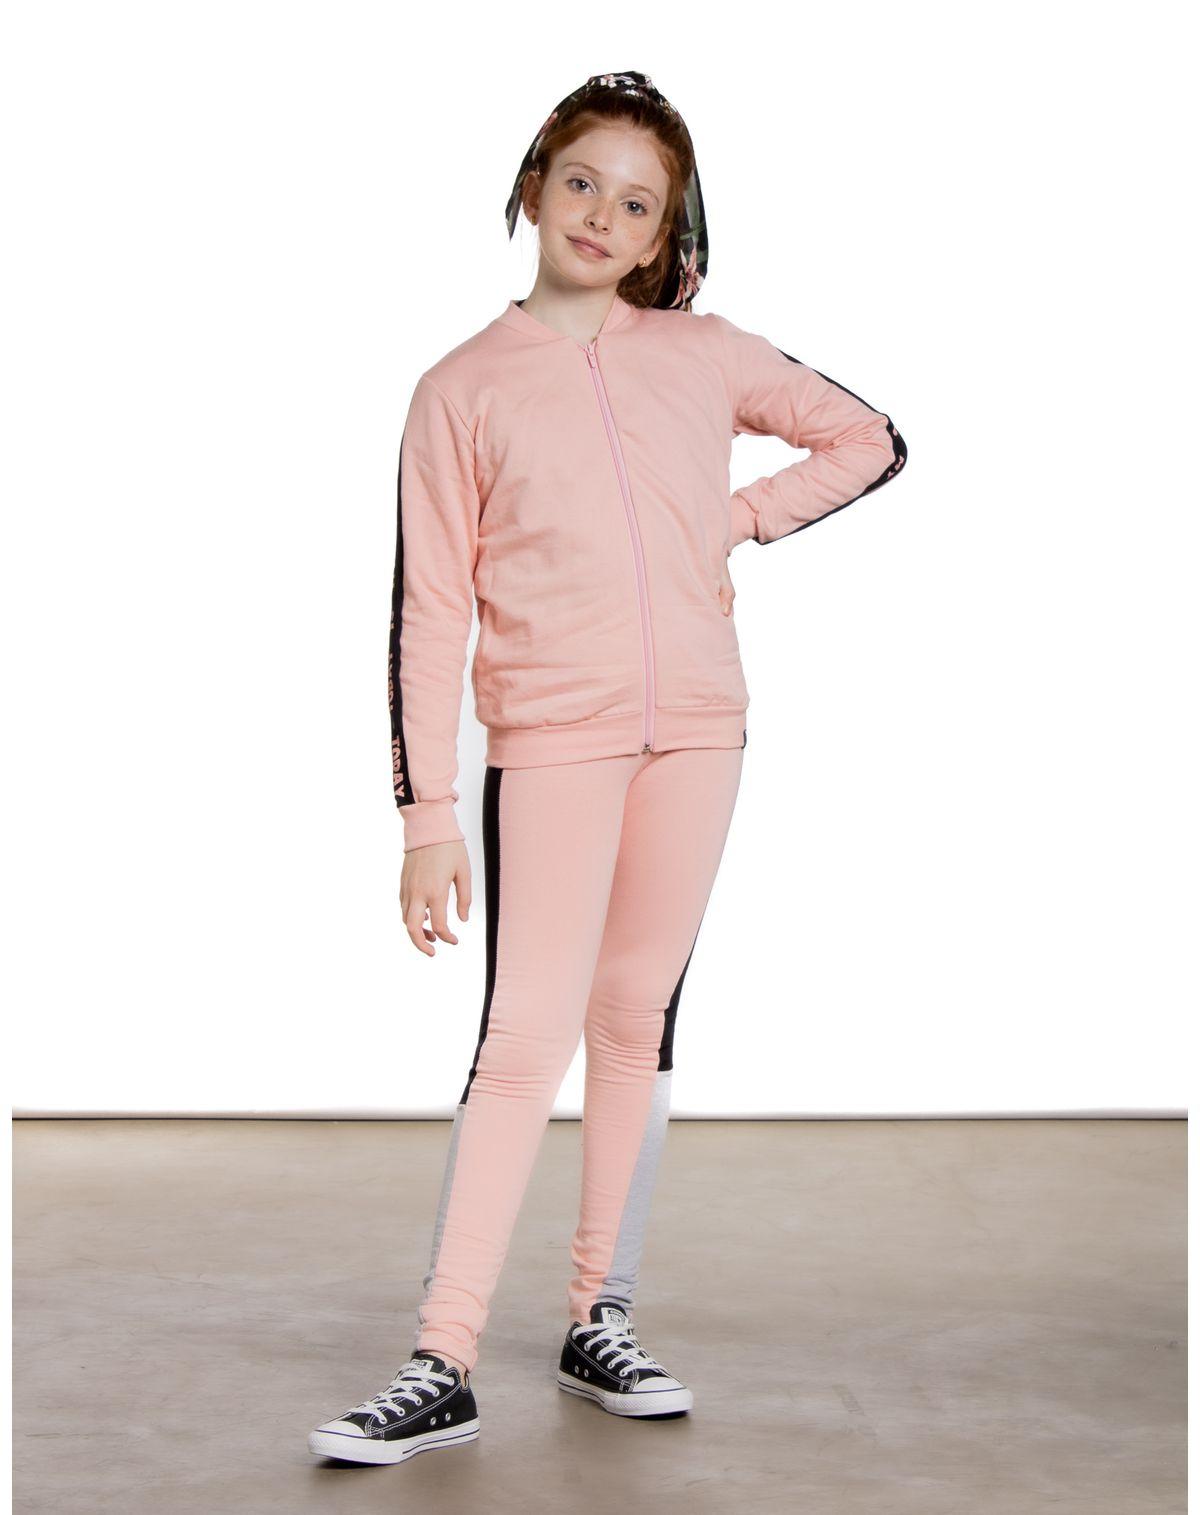 578226007-conjunto-moletom-juvenil-menina-estampa-todo-dia-e-meu-dia-rosa-14-83a